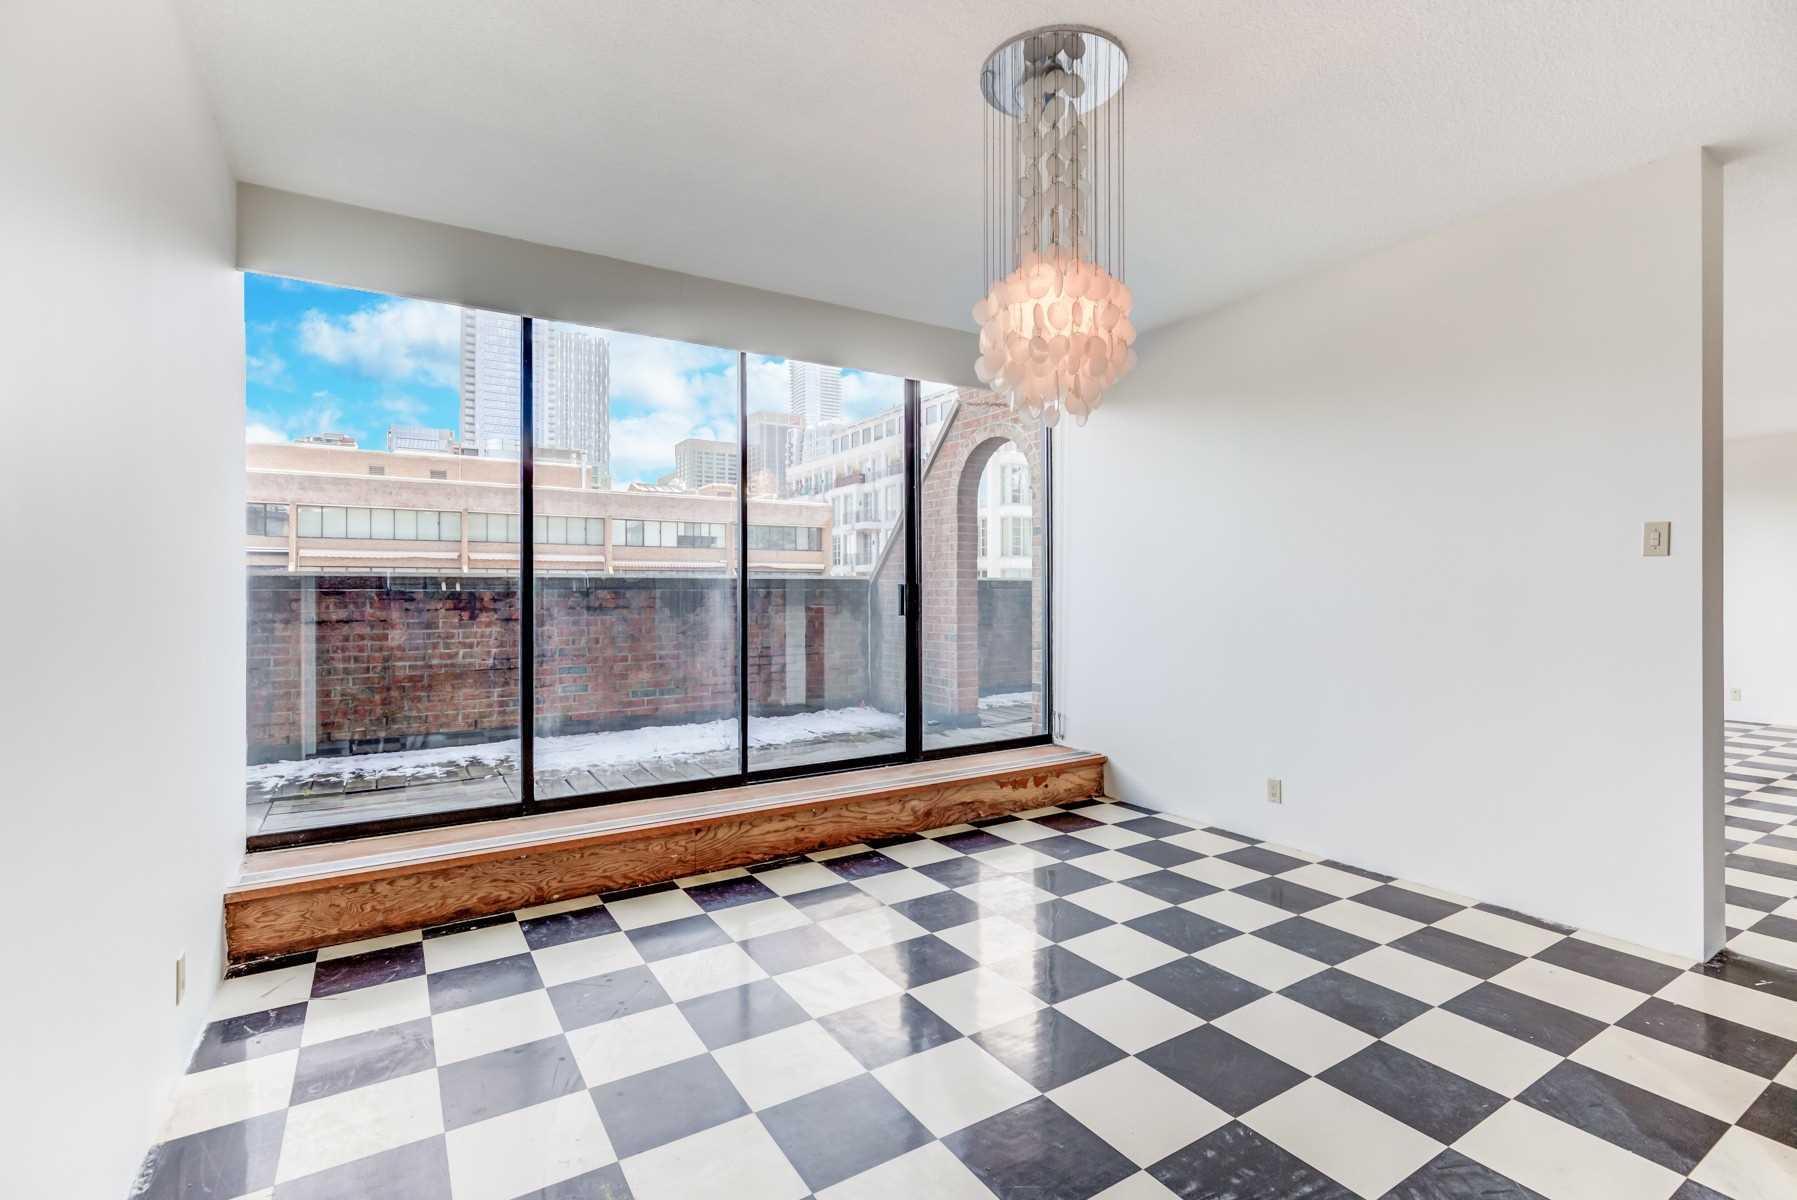 607 - 55A Avenue Rd - Annex Condo Apt for sale, 2 Bedrooms (C5185690) - #16